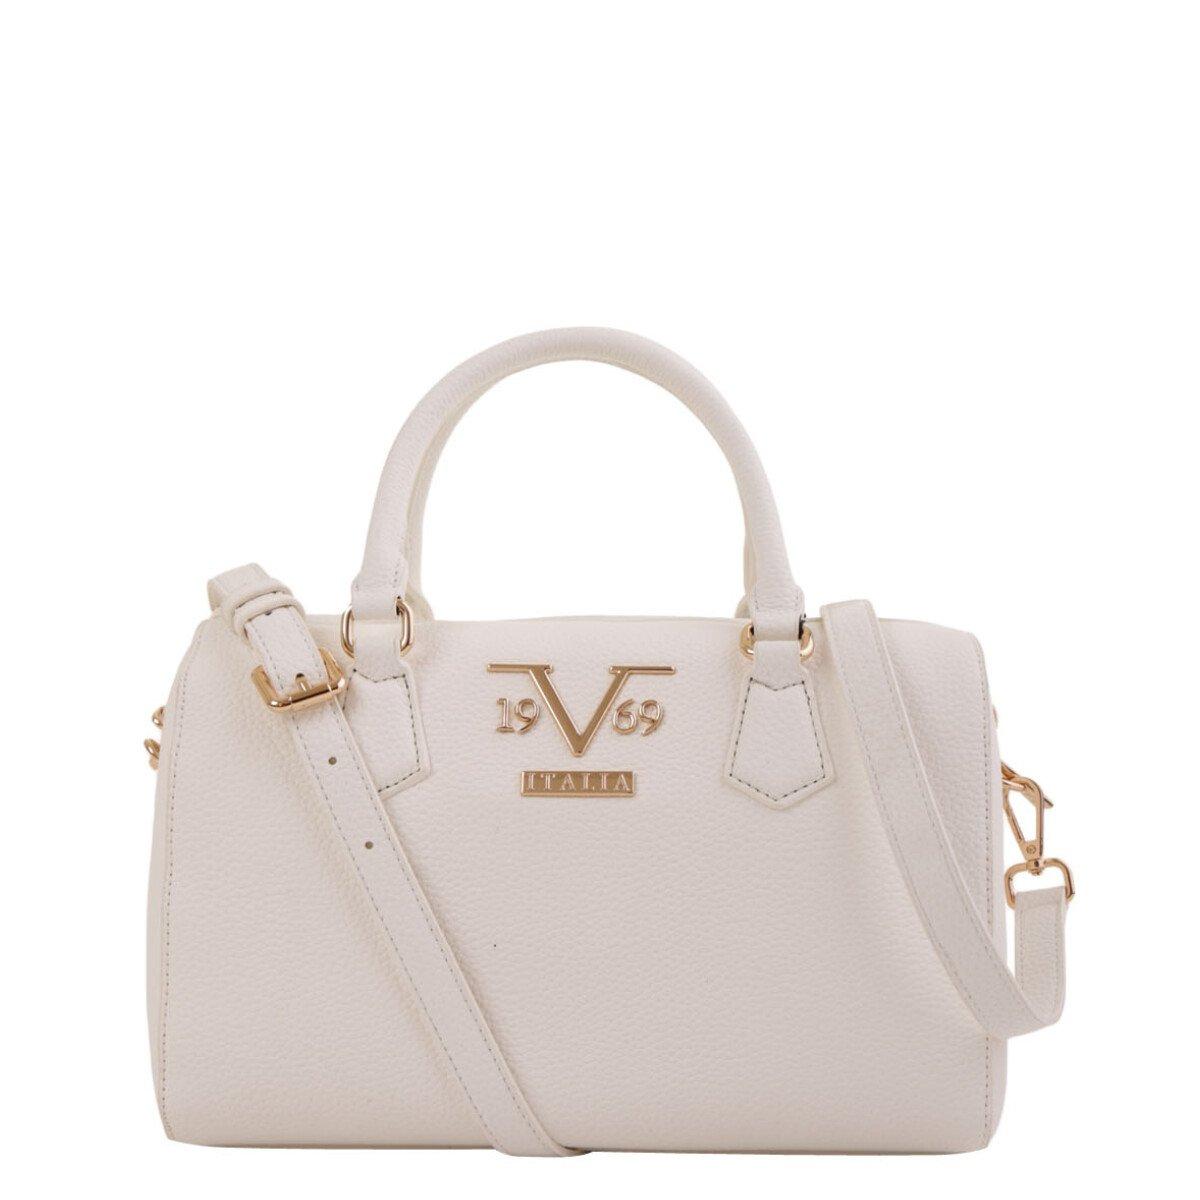 19v69 Italia Women's Handbag Various Colours 319009 - white UNICA